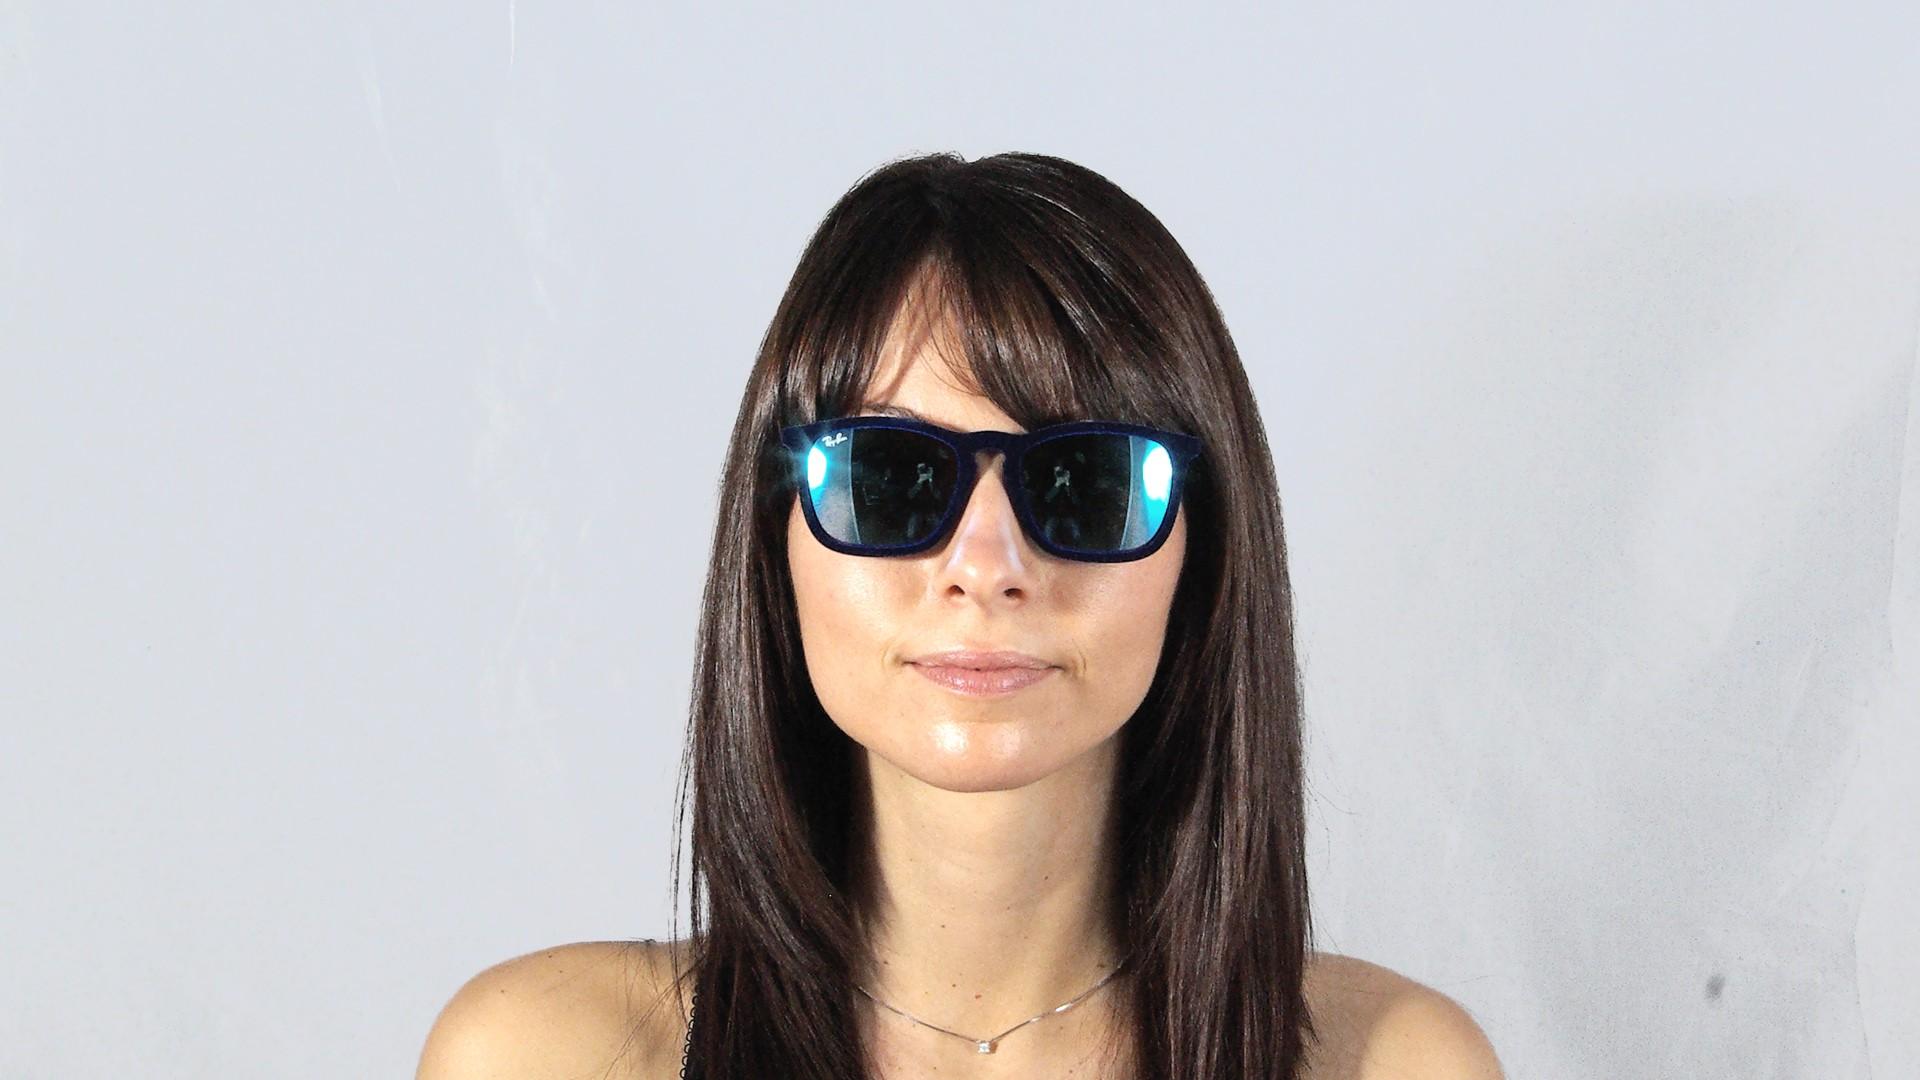 ad31808214e Sunglasses Ray-Ban Chris Velvet Edition Blue RB4187 6081 55 54-18 Medium  Mirror